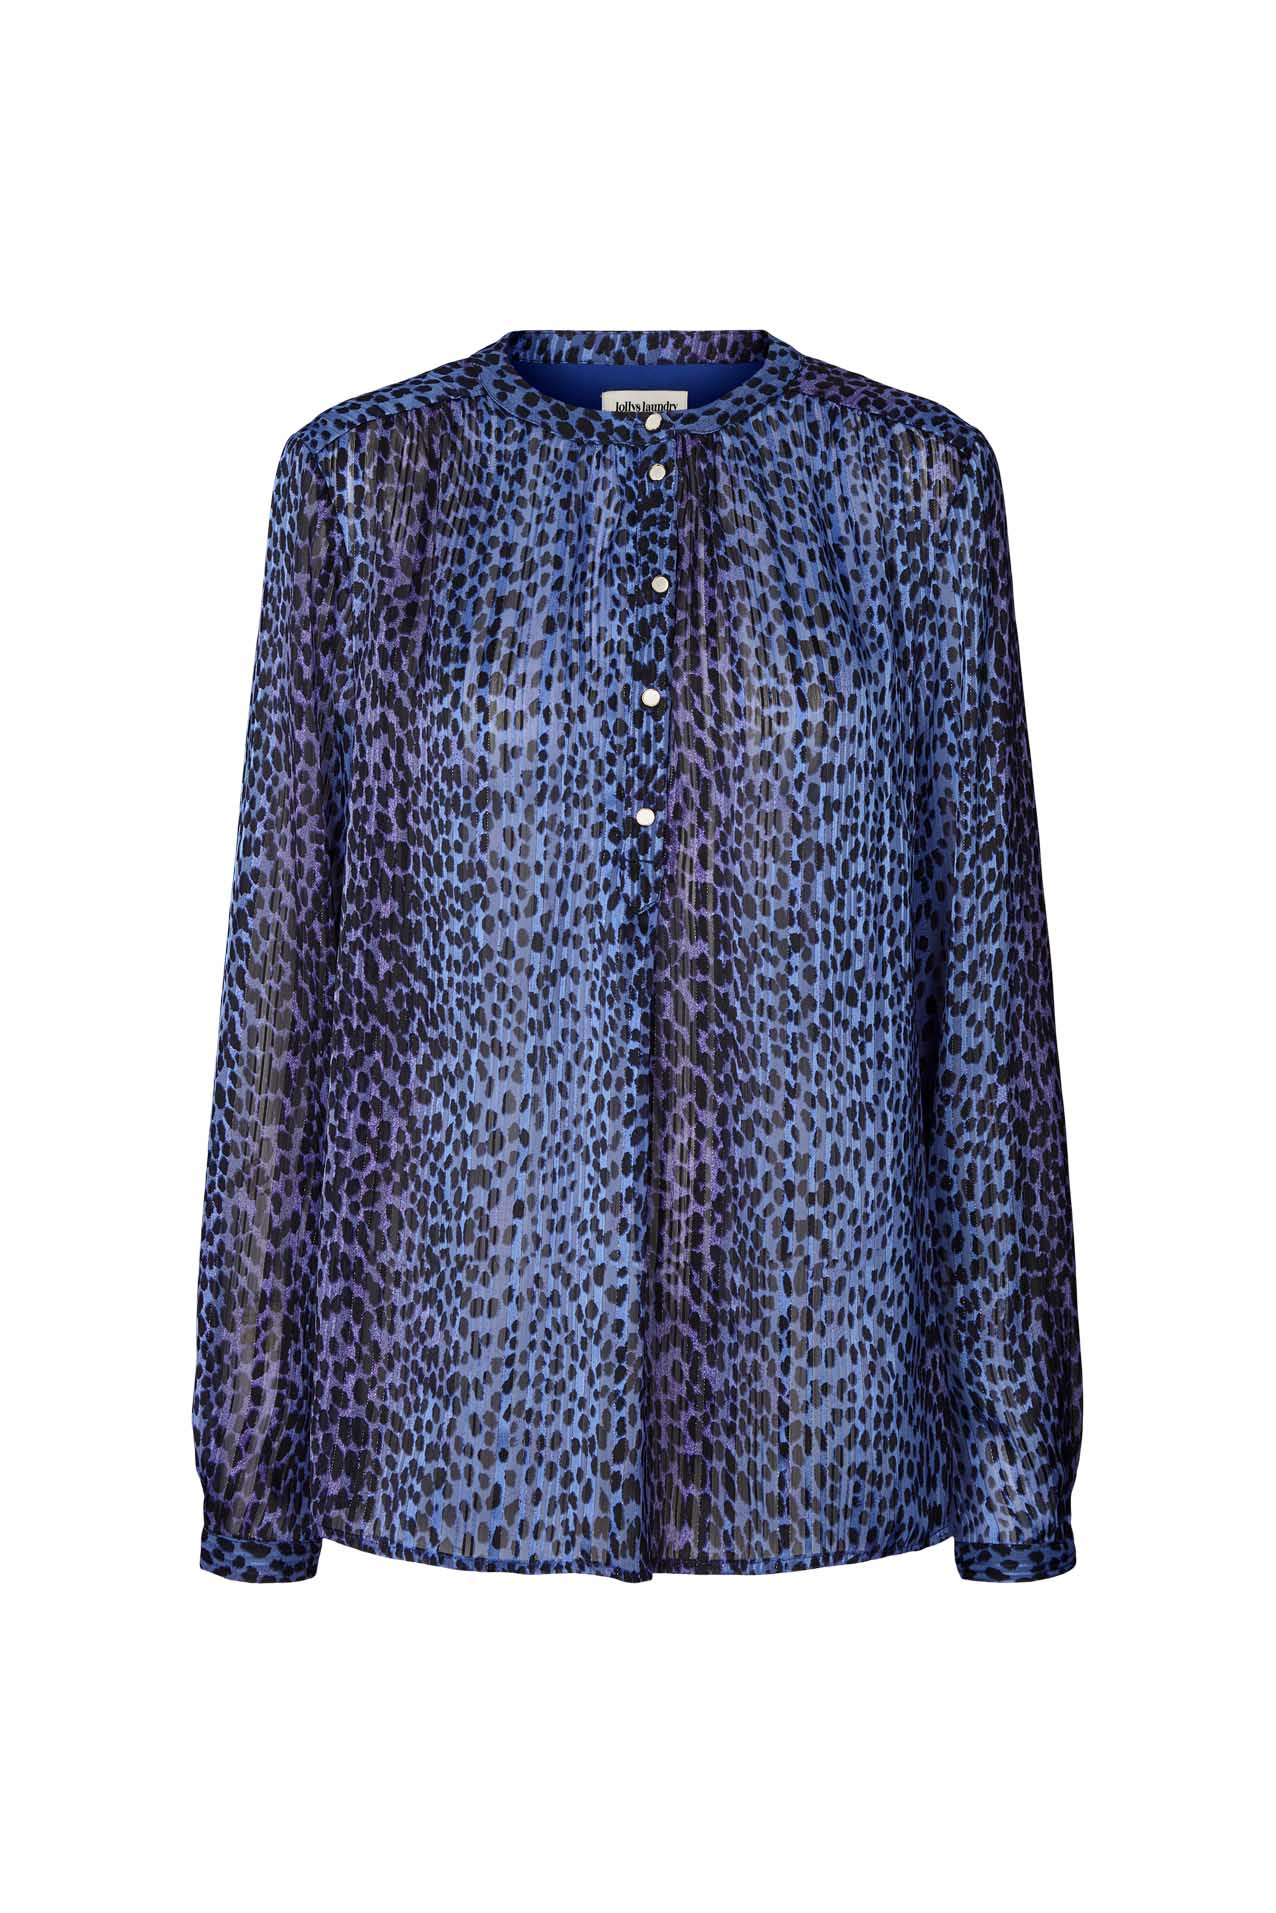 Lollys Laundry Singh skjorte, neon blue, x-large